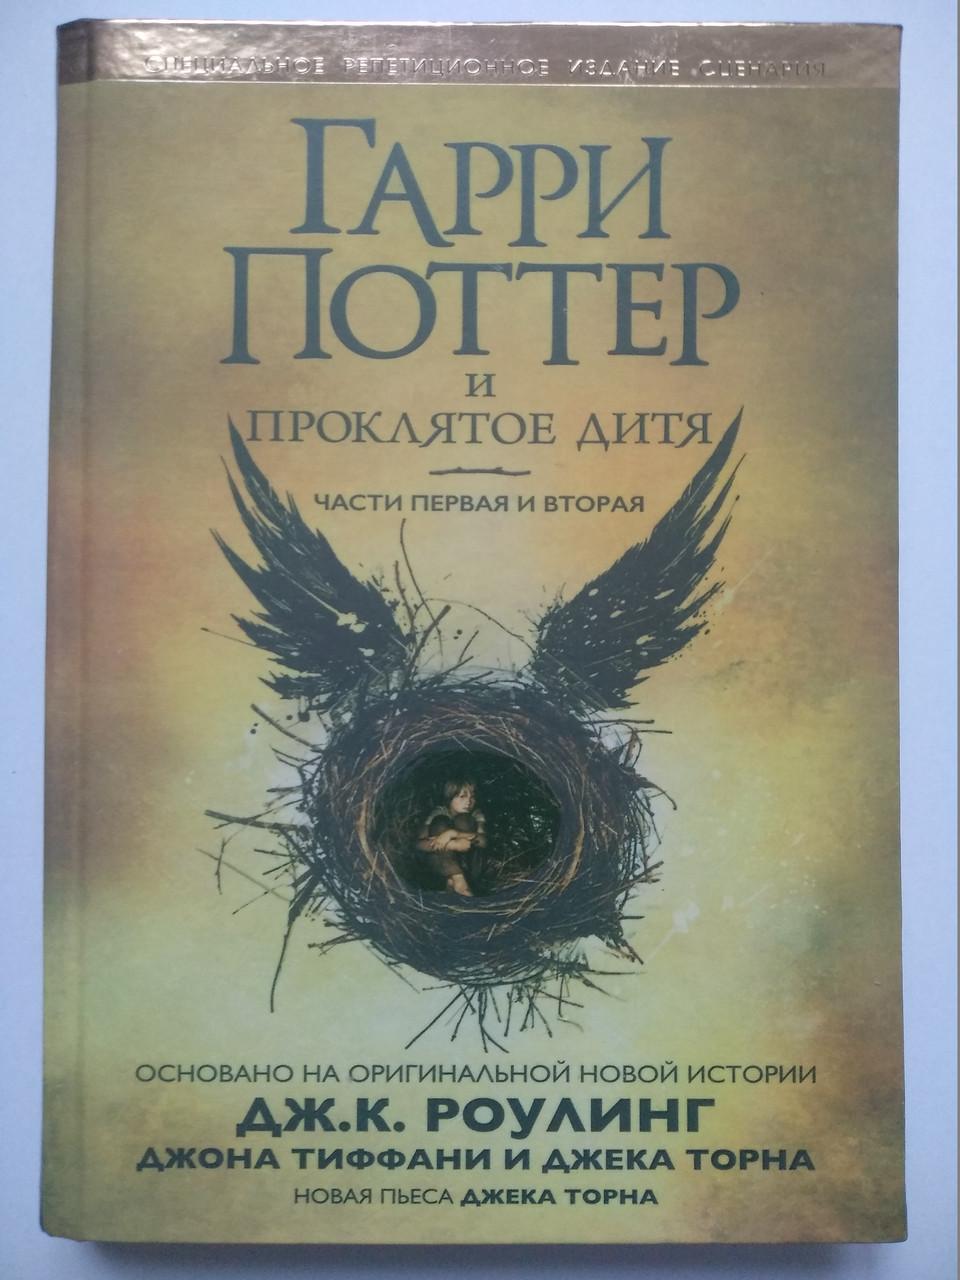 Ролинг - Гарри Поттер и Проклятое дитя: продажа, цена в ...